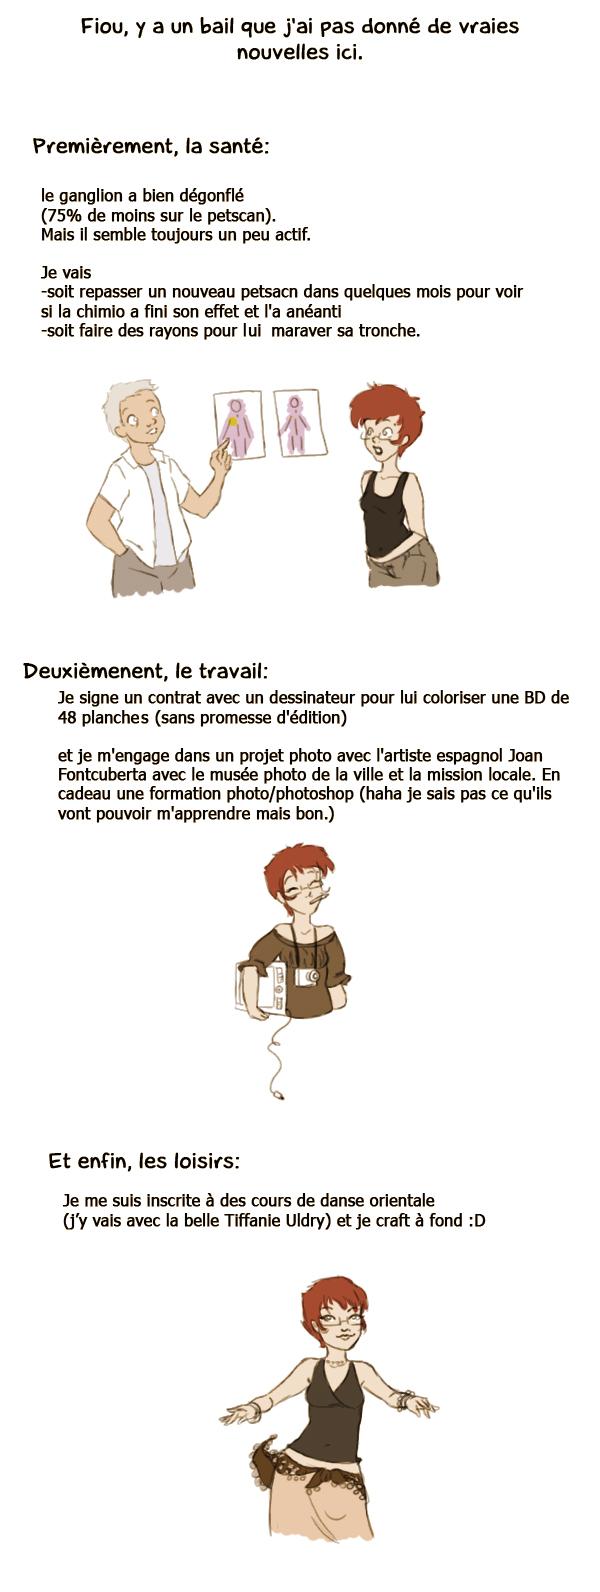 http://sorephene.free.fr/blogBD/524.jpg